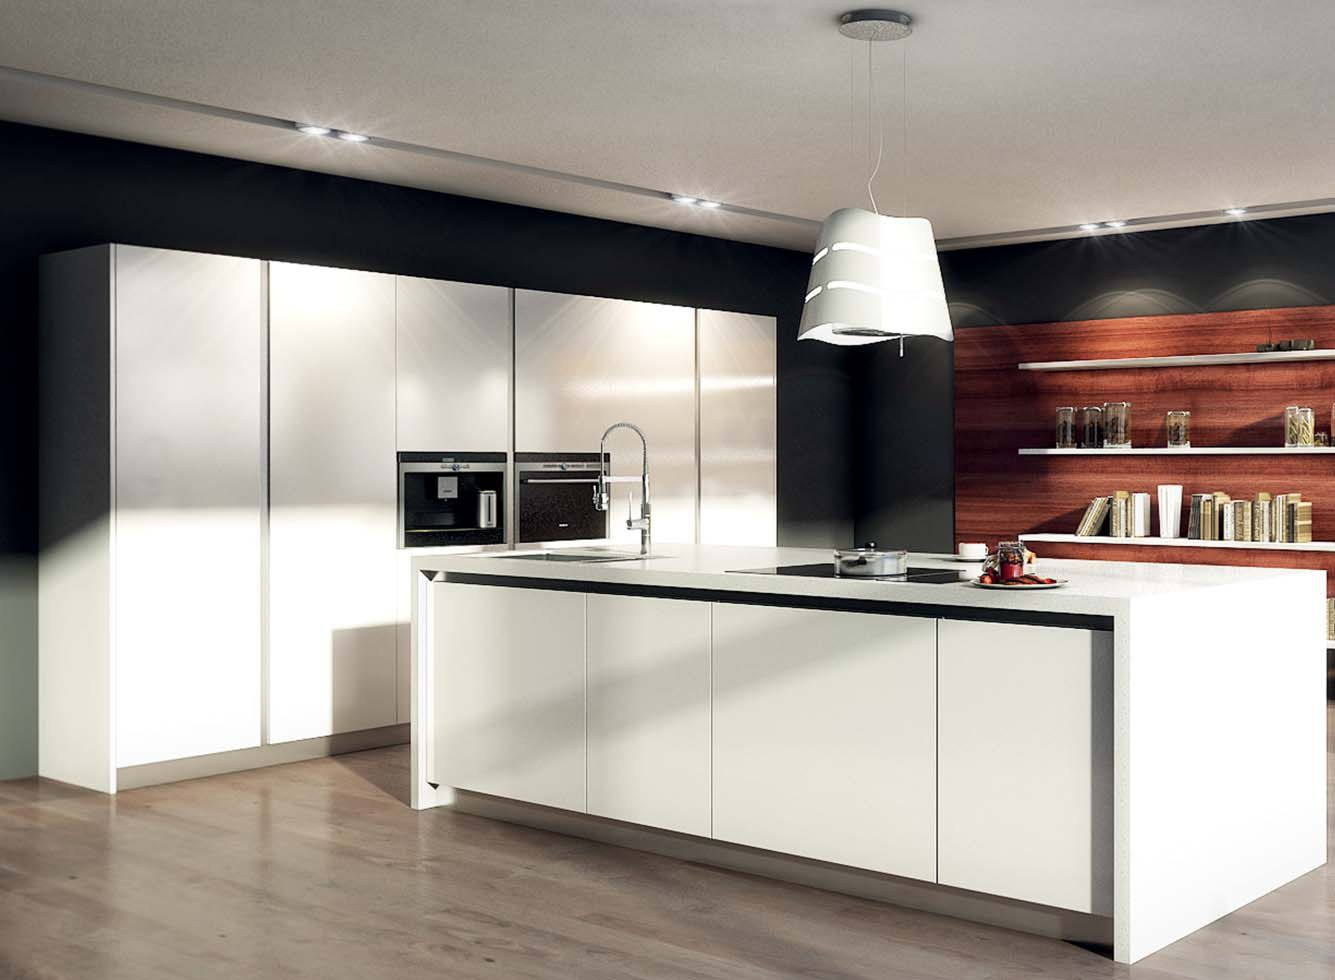 Cocina 69 cocinas capis dise o y fabricaci n de cocinas for Configurador de cocinas